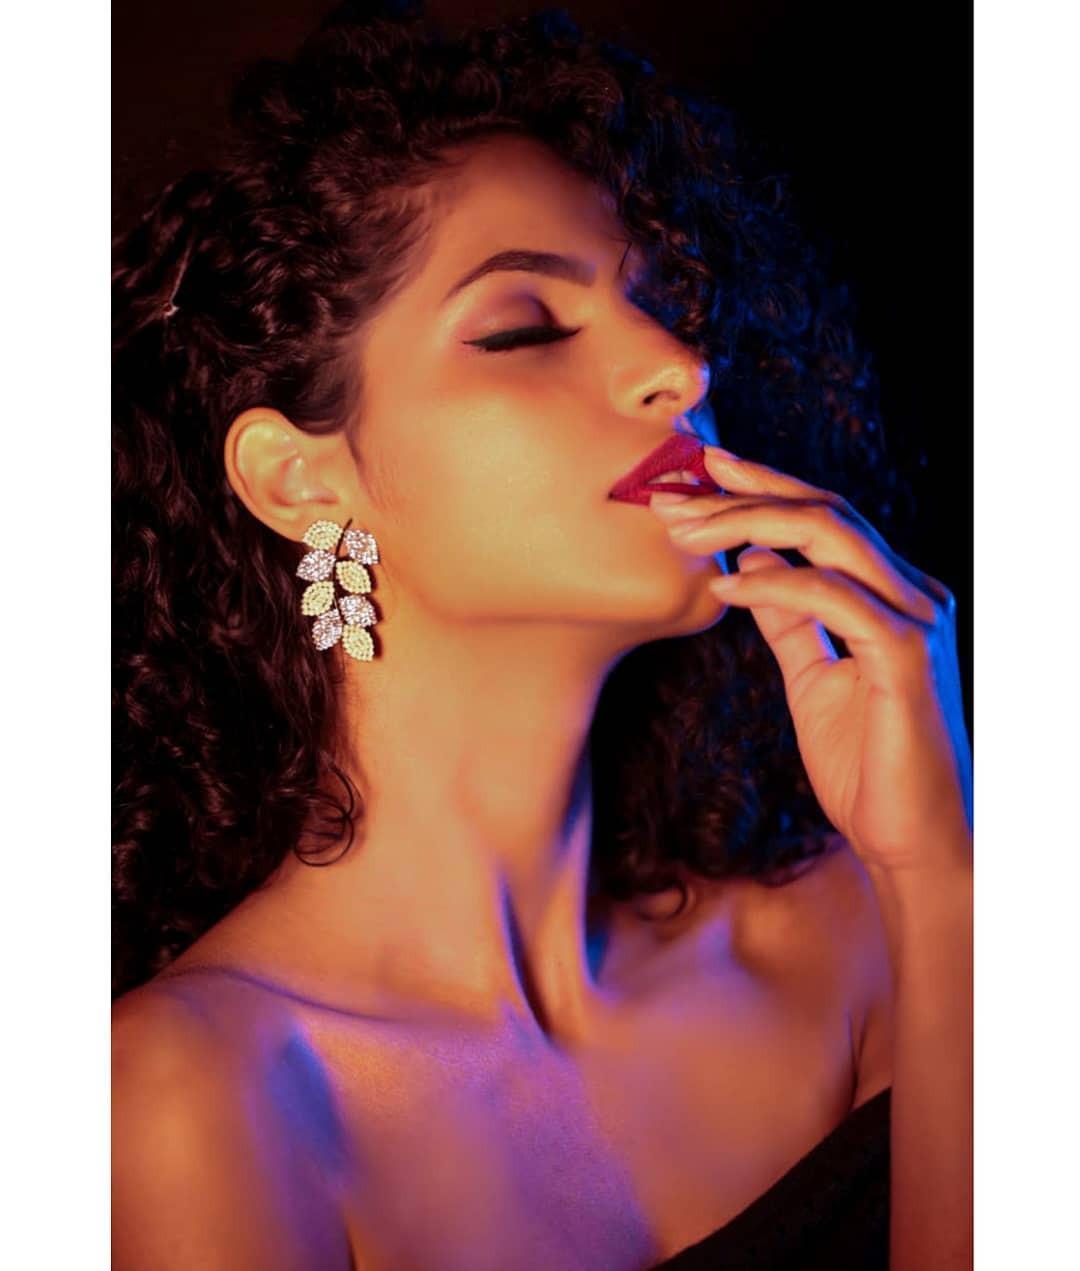 geicyelly mendes, top 20 de miss brasil mundo 2019. - Página 2 Fylfdx10